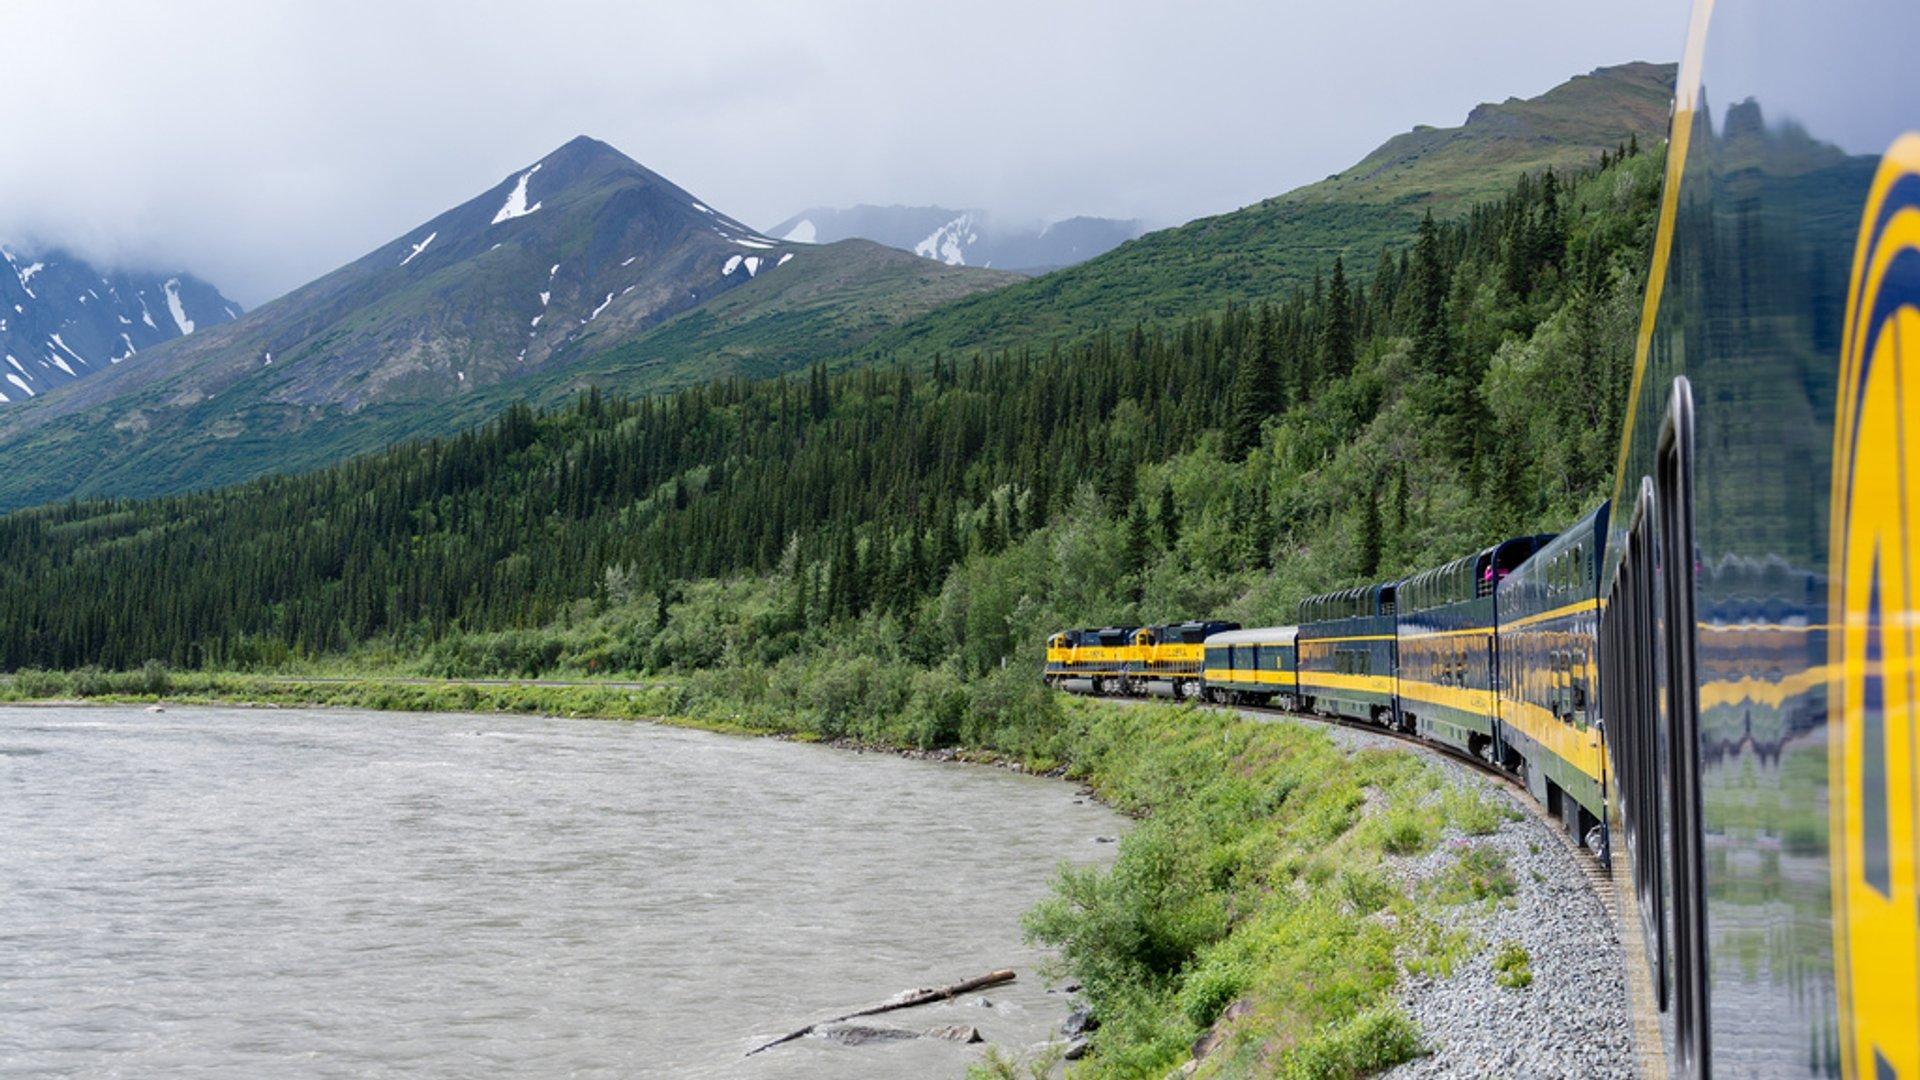 Summer Railroad Trip in Alaska 2020 - Best Time